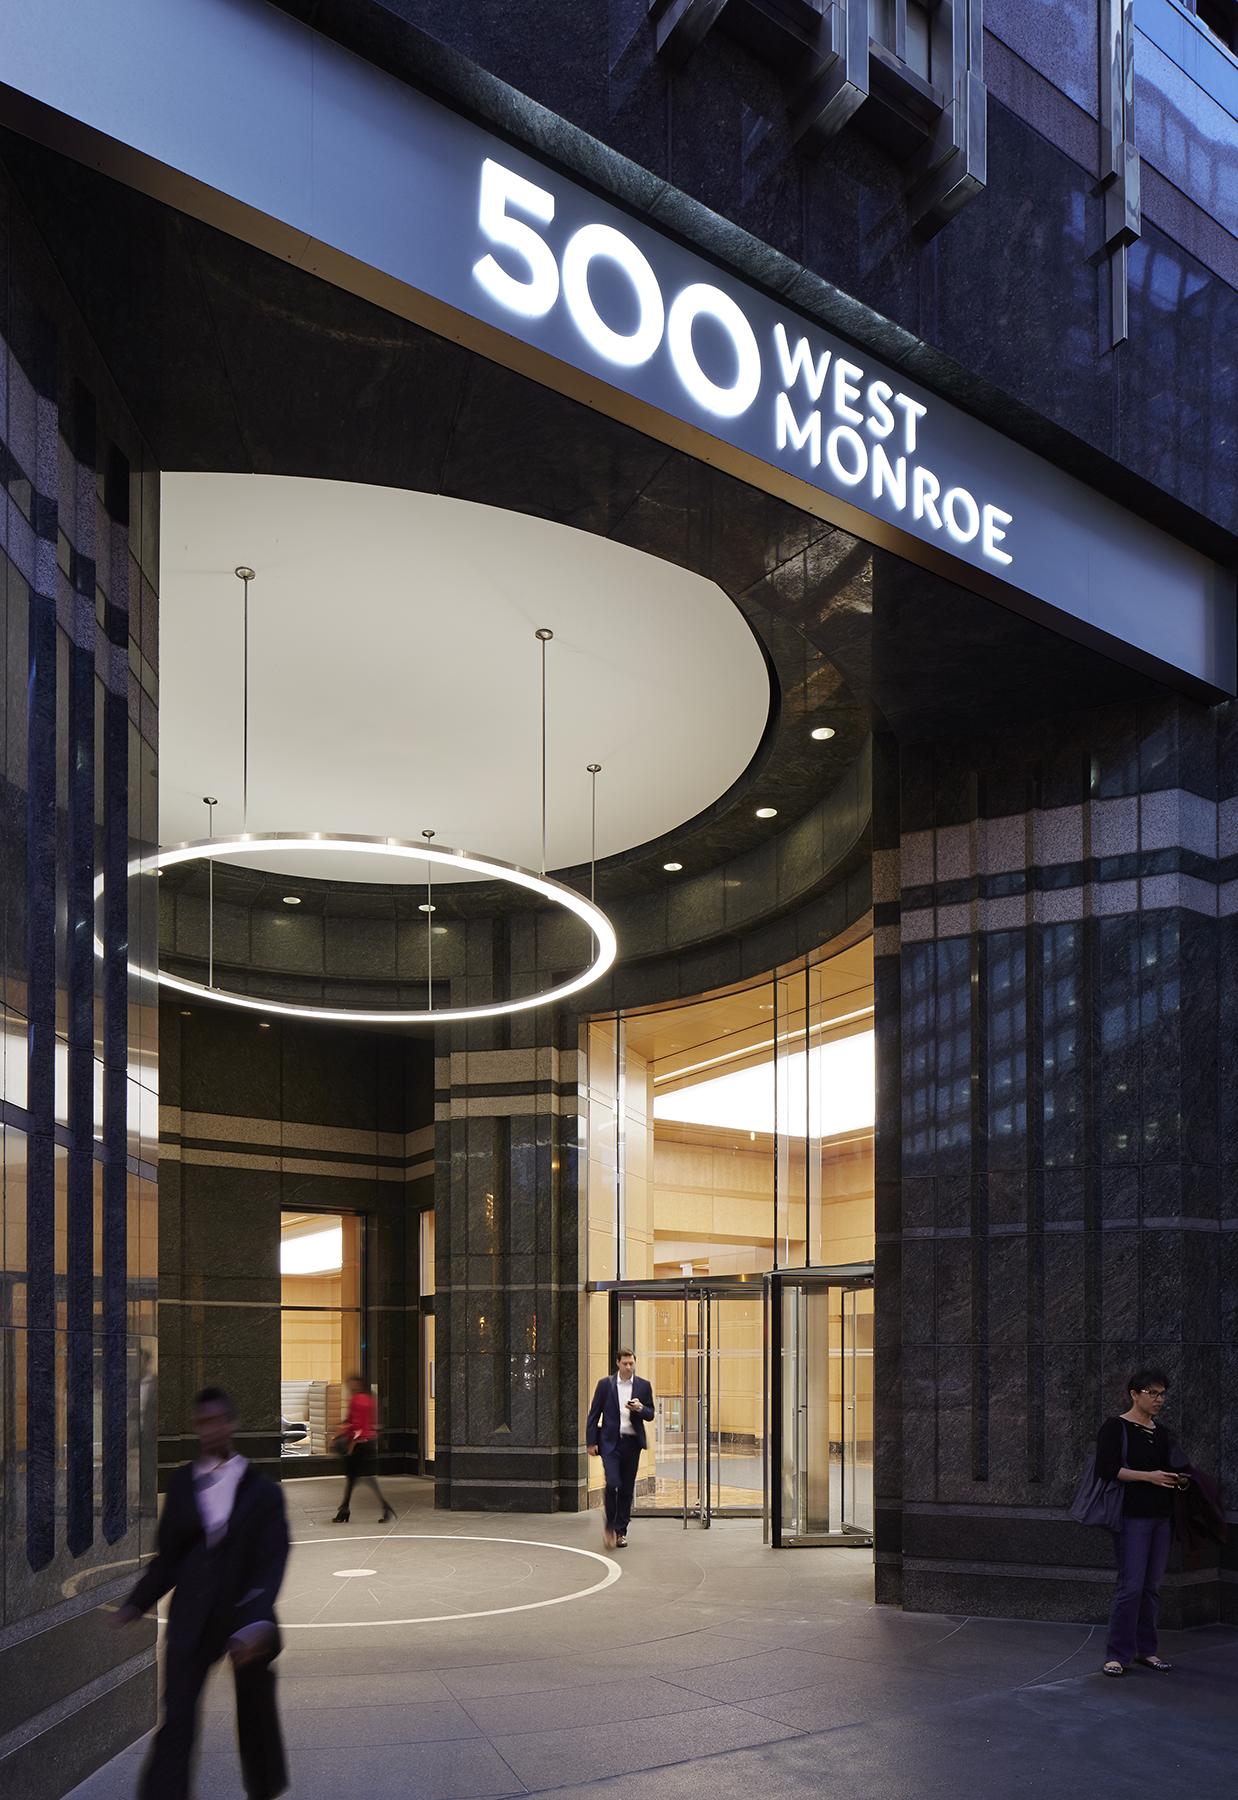 500 West Monroe Chicago Illinois Exterio